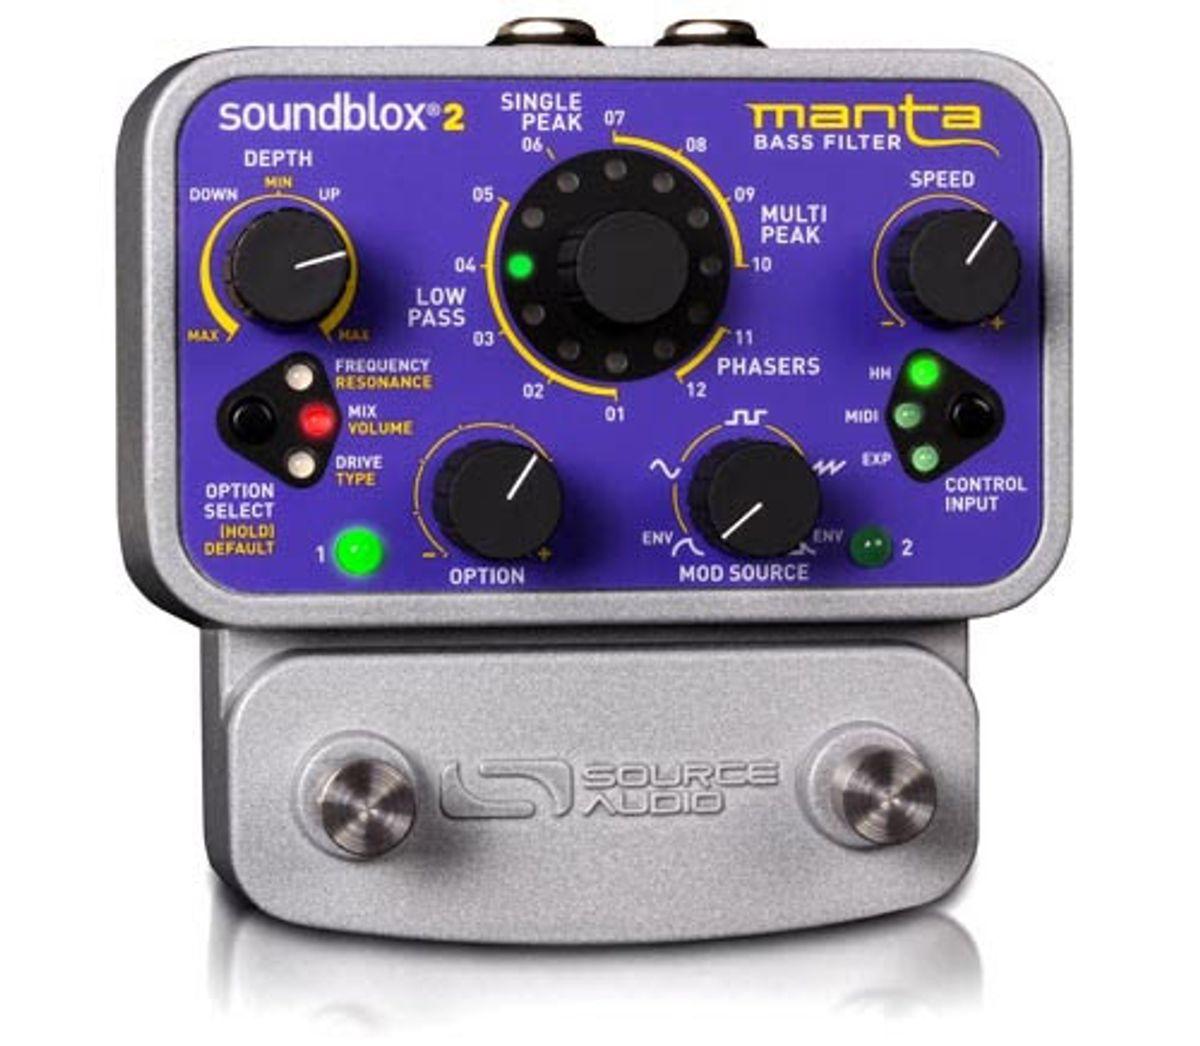 Source Audio Introduces the Soundblox 2 Manta Bass Filter